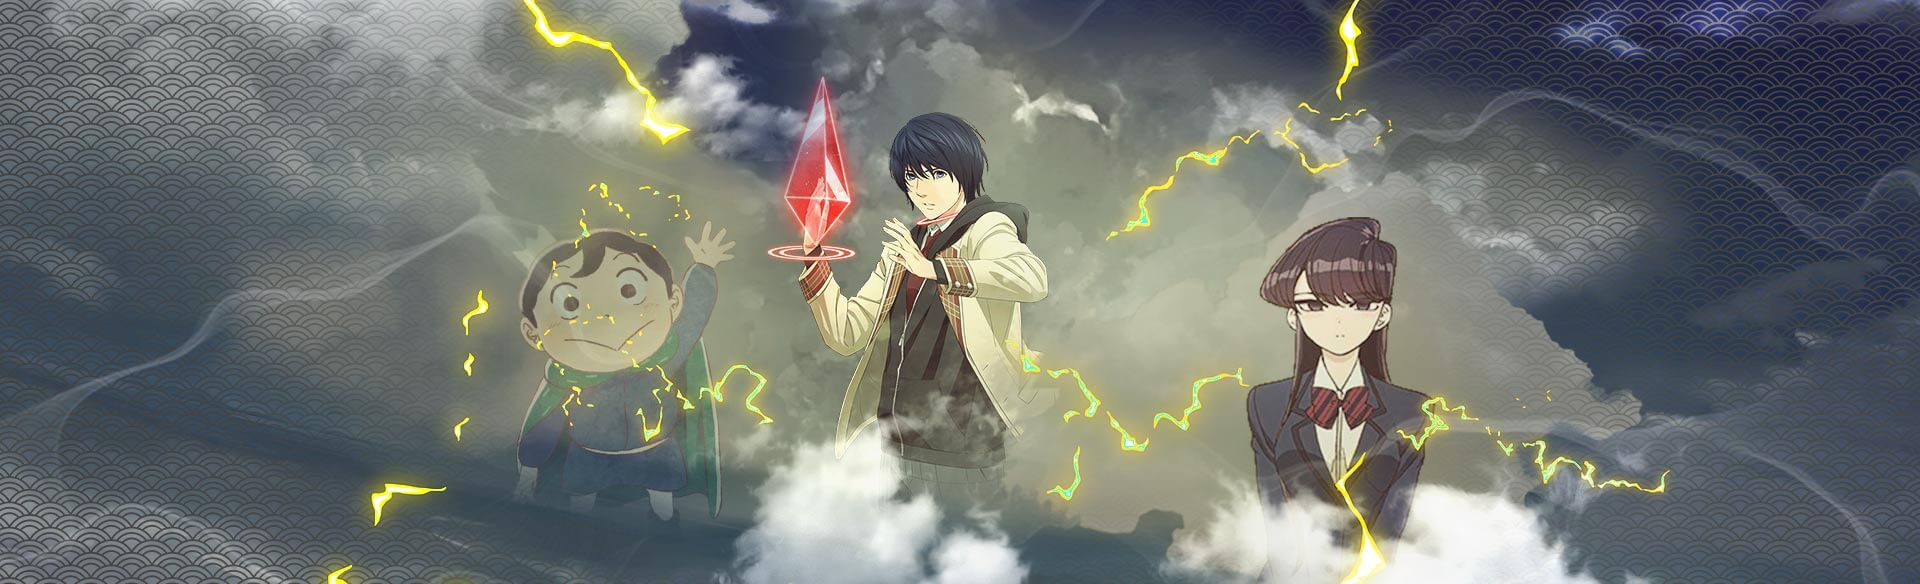 Platinum end, ranking of Kings e Komi-san wa, Komyushou desu animes trovejantes da temporada - outubro 2021